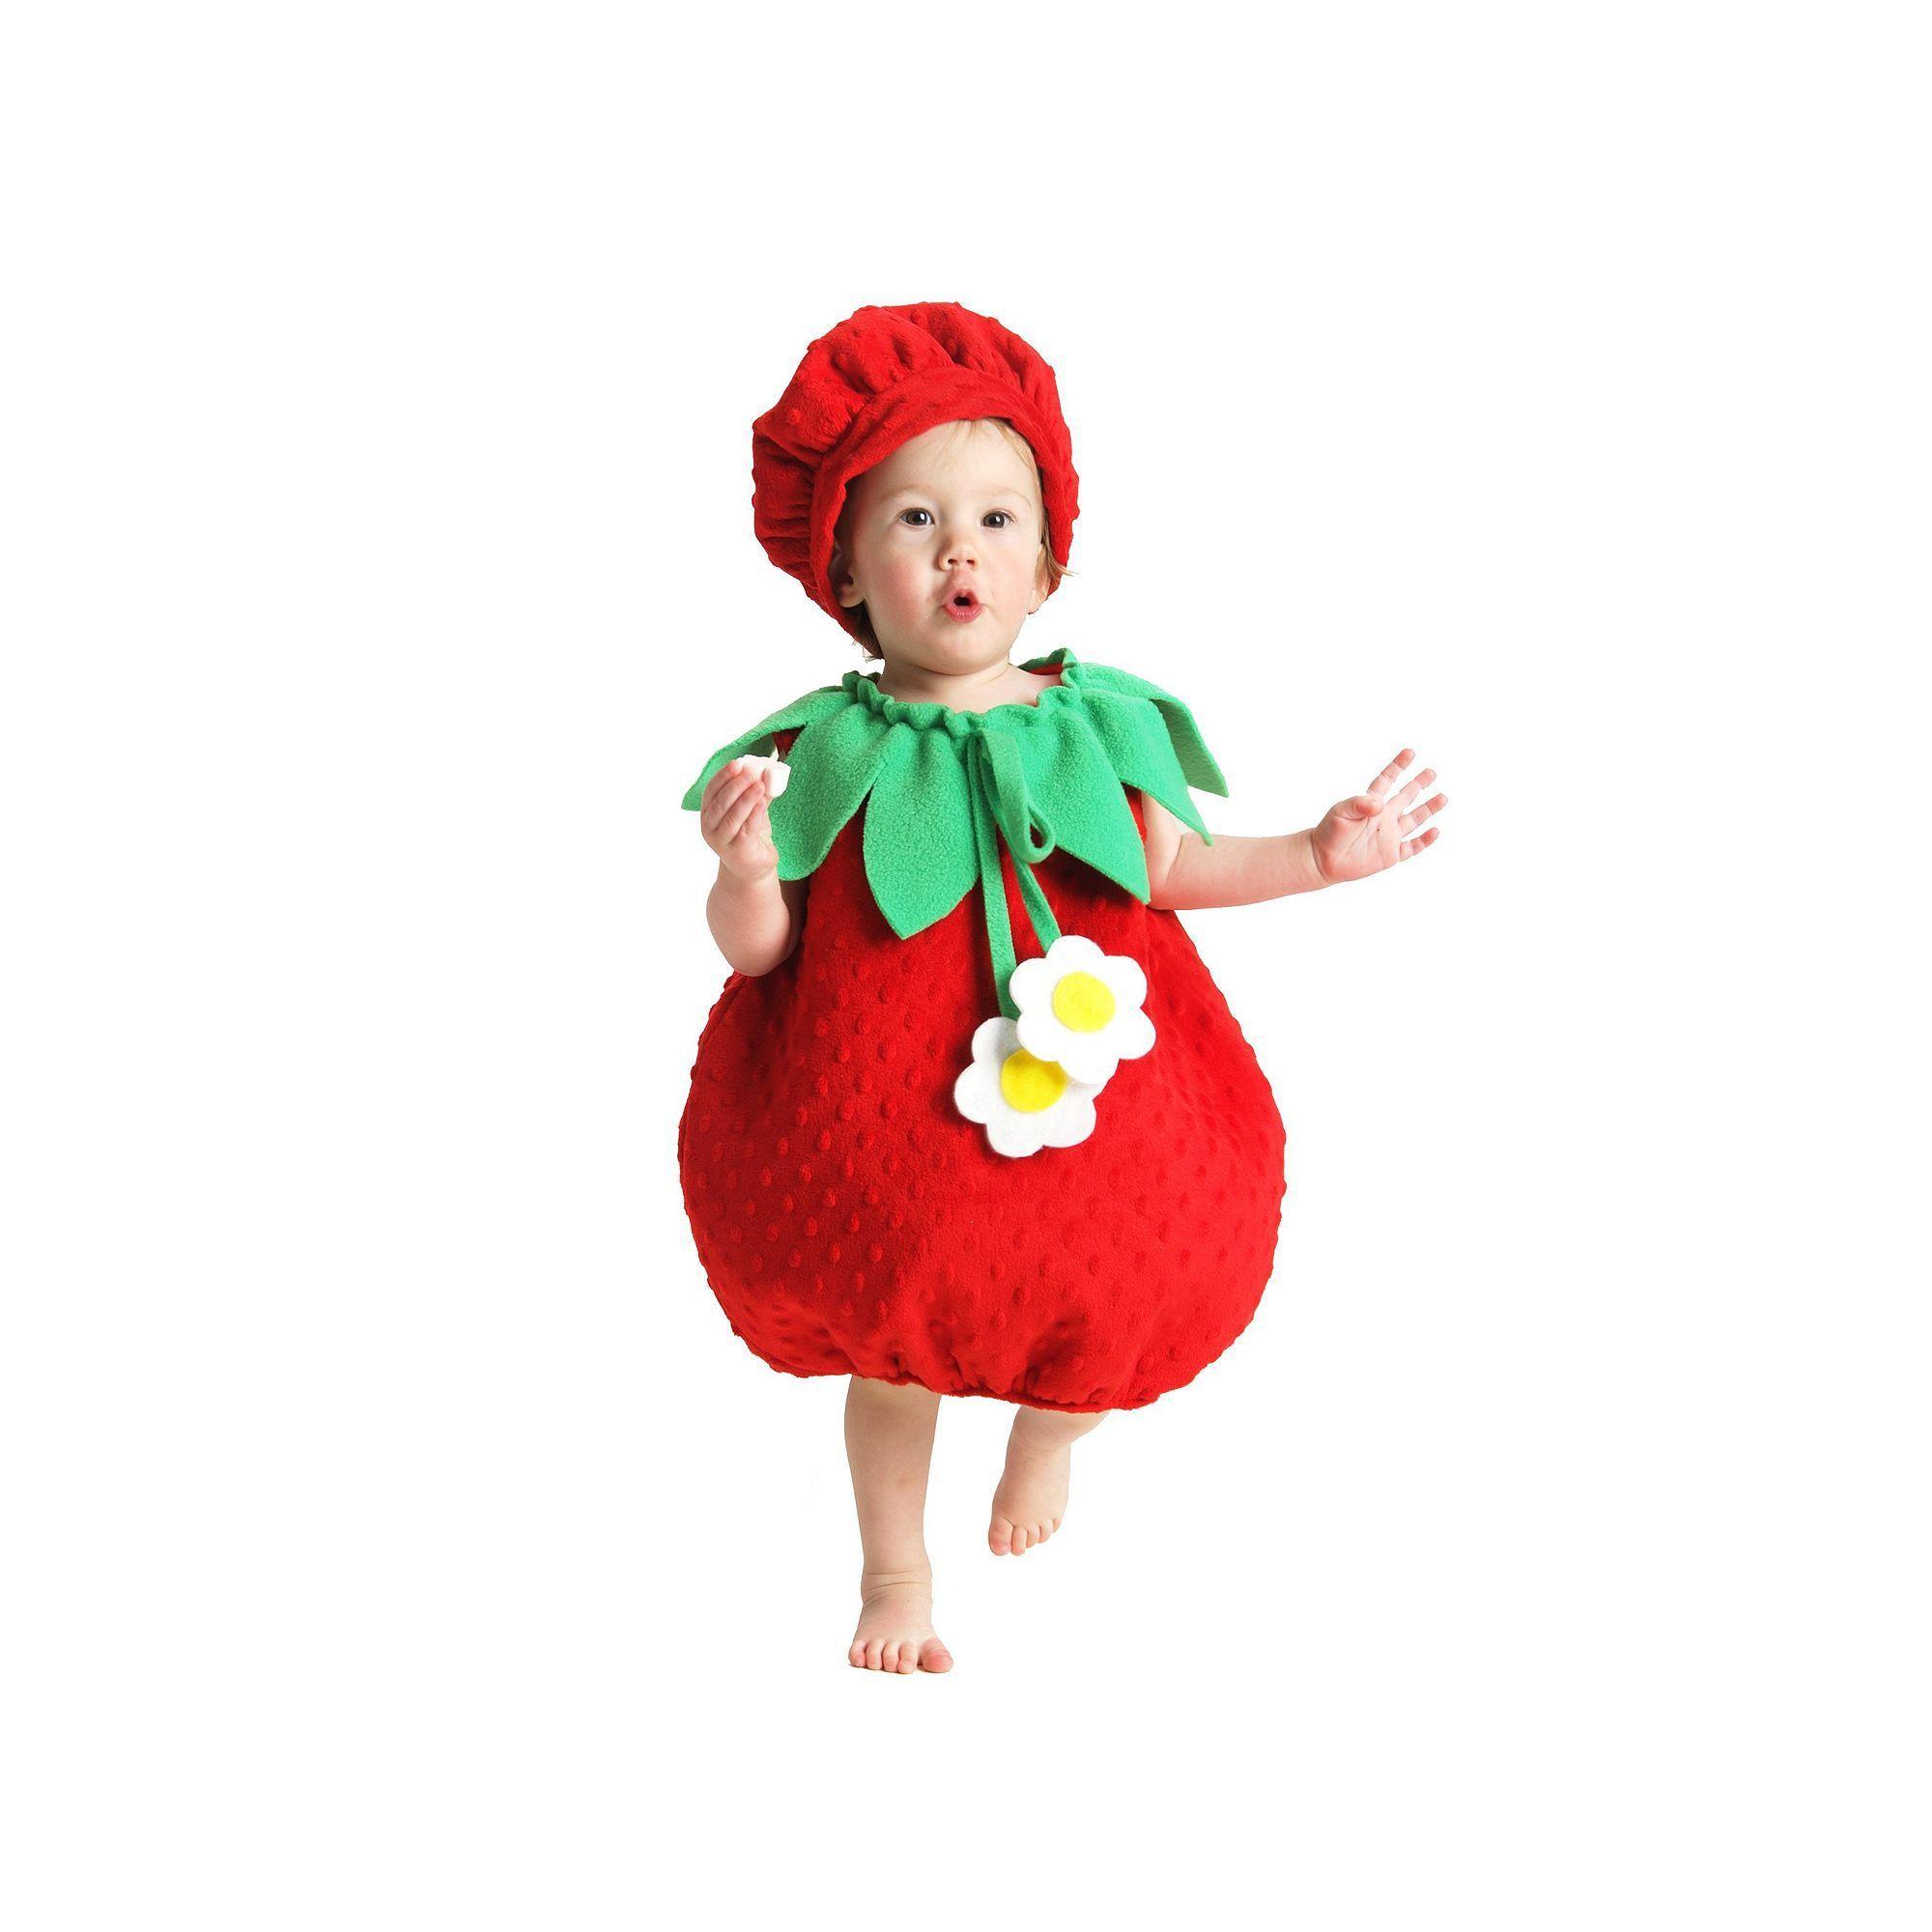 strawberry costume toddler kids unisex size 2t multicolor products pinterest. Black Bedroom Furniture Sets. Home Design Ideas